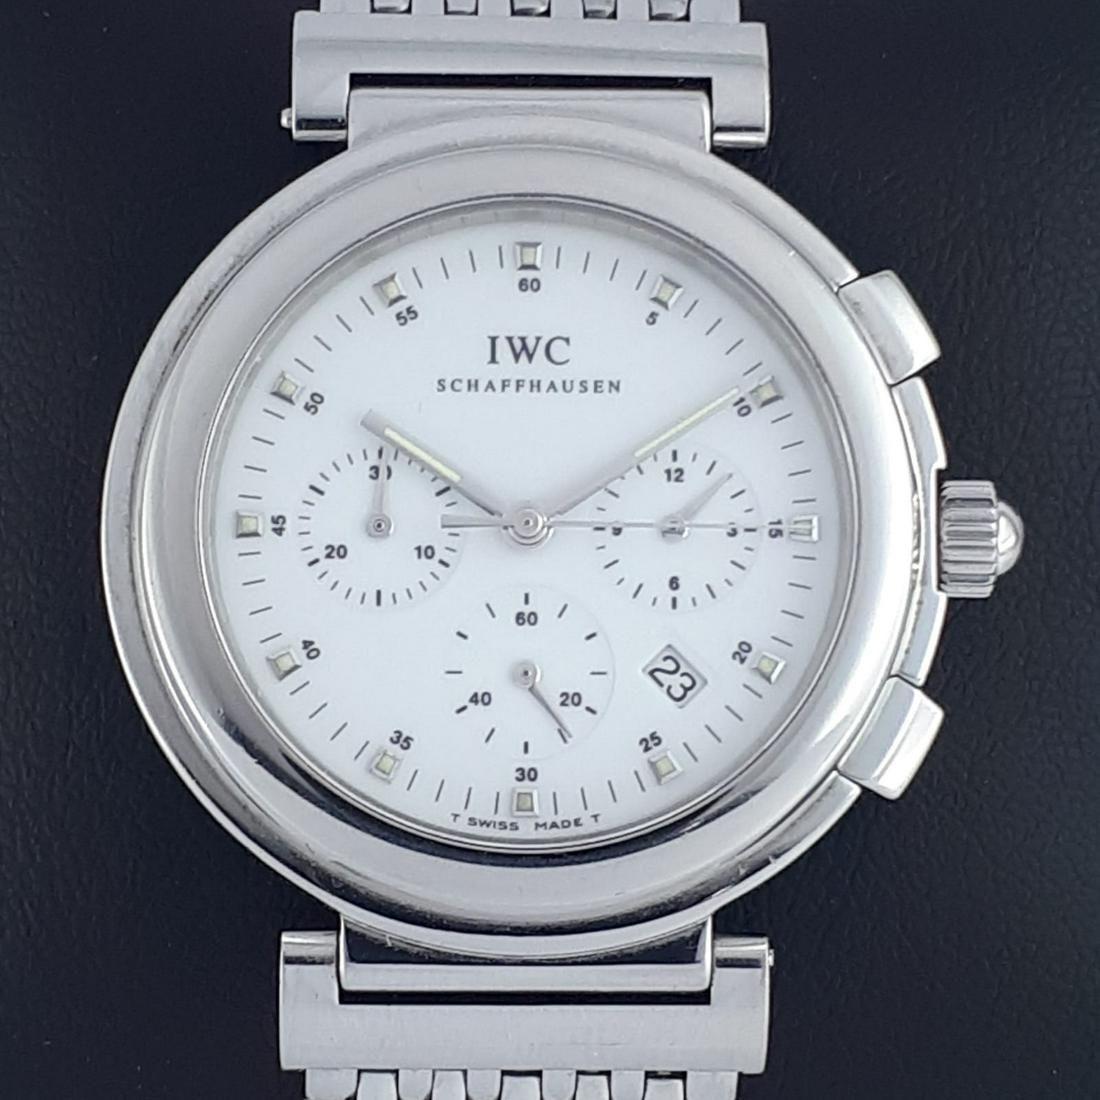 IWC - Davinci SL Chronographe - Ref: IW3728 - Men -